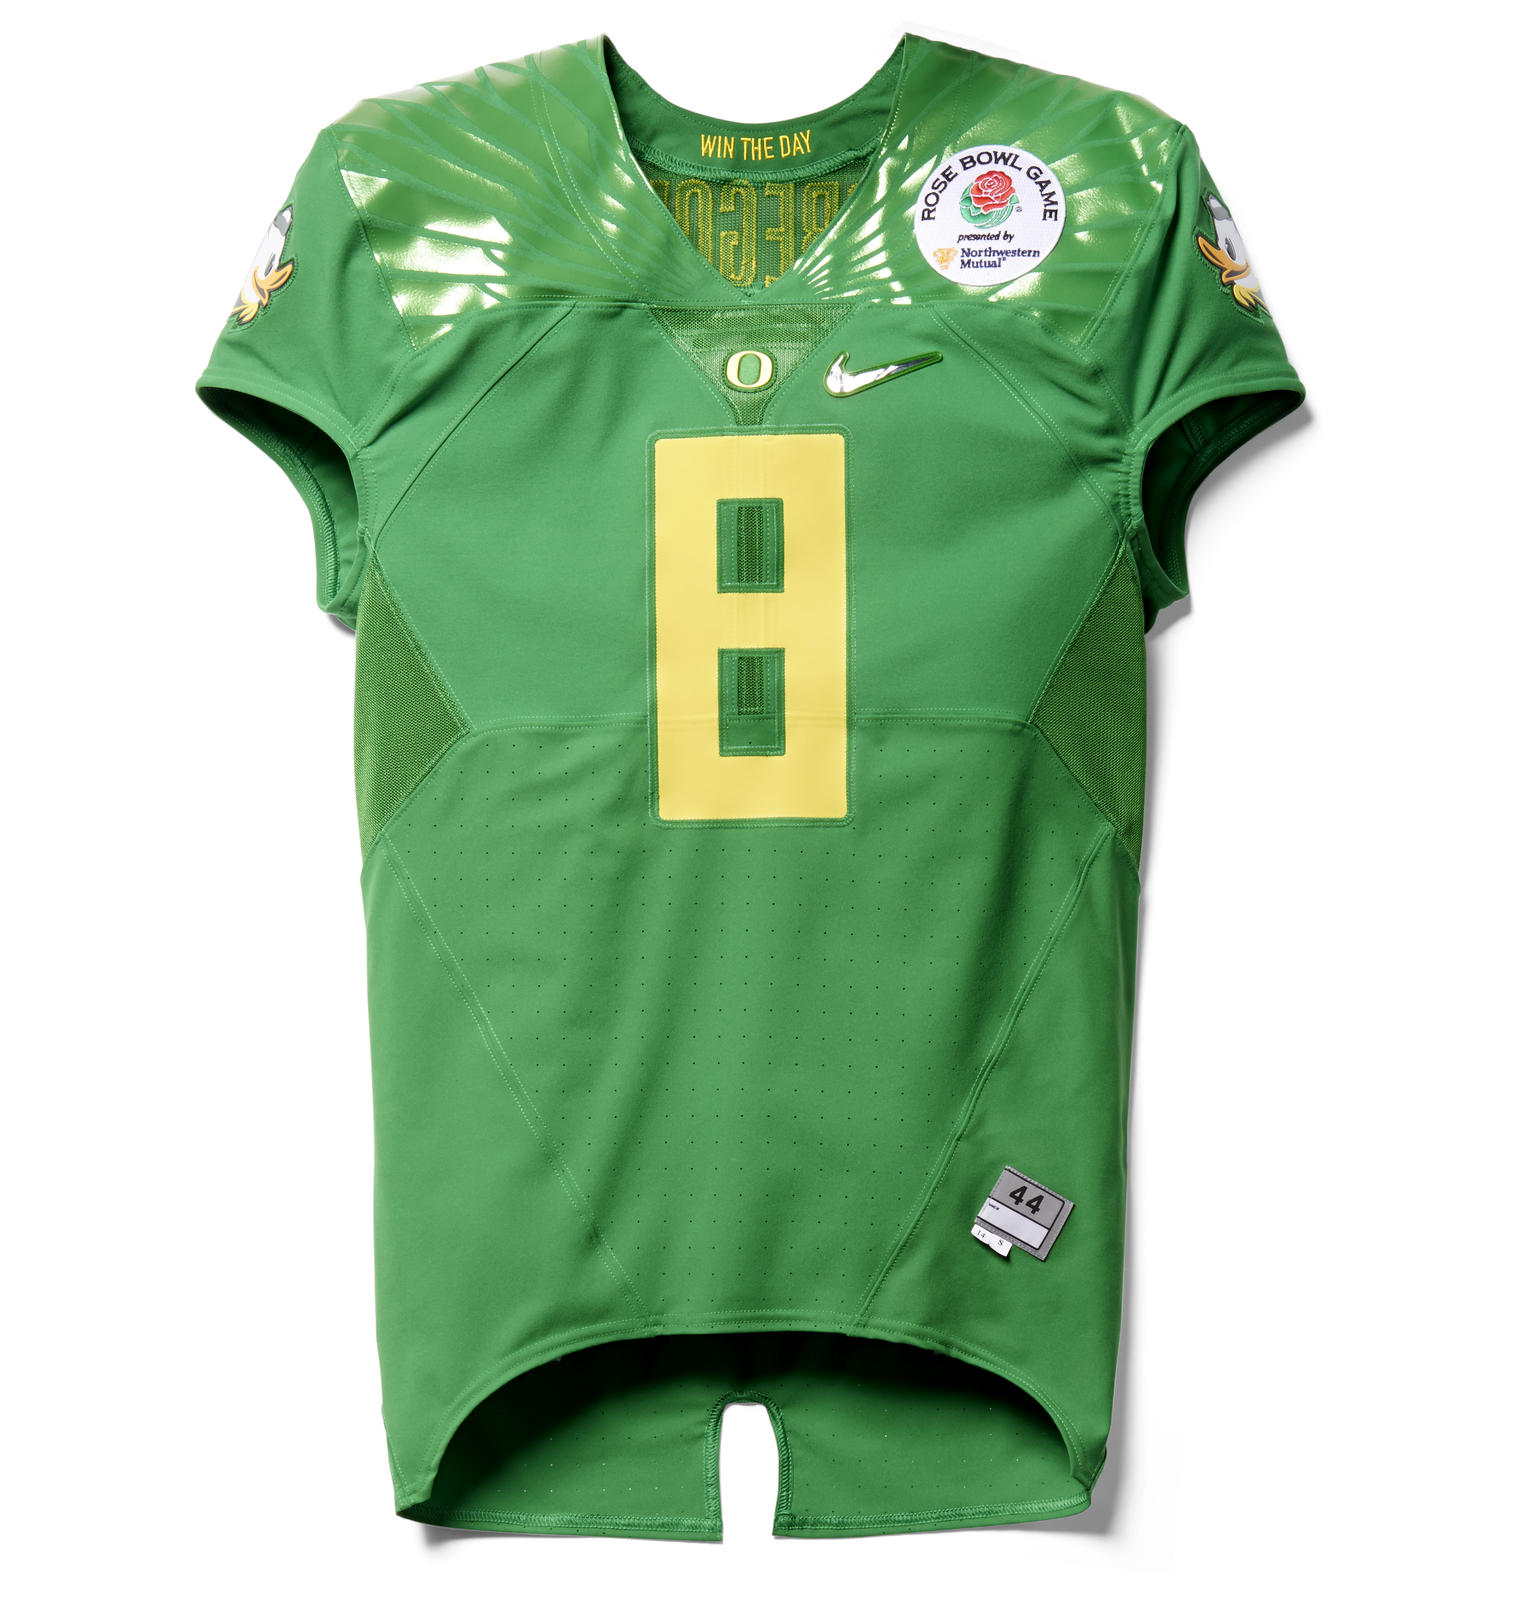 Nike-Football-innovations-Mach-Speed-Uniform-Jersey